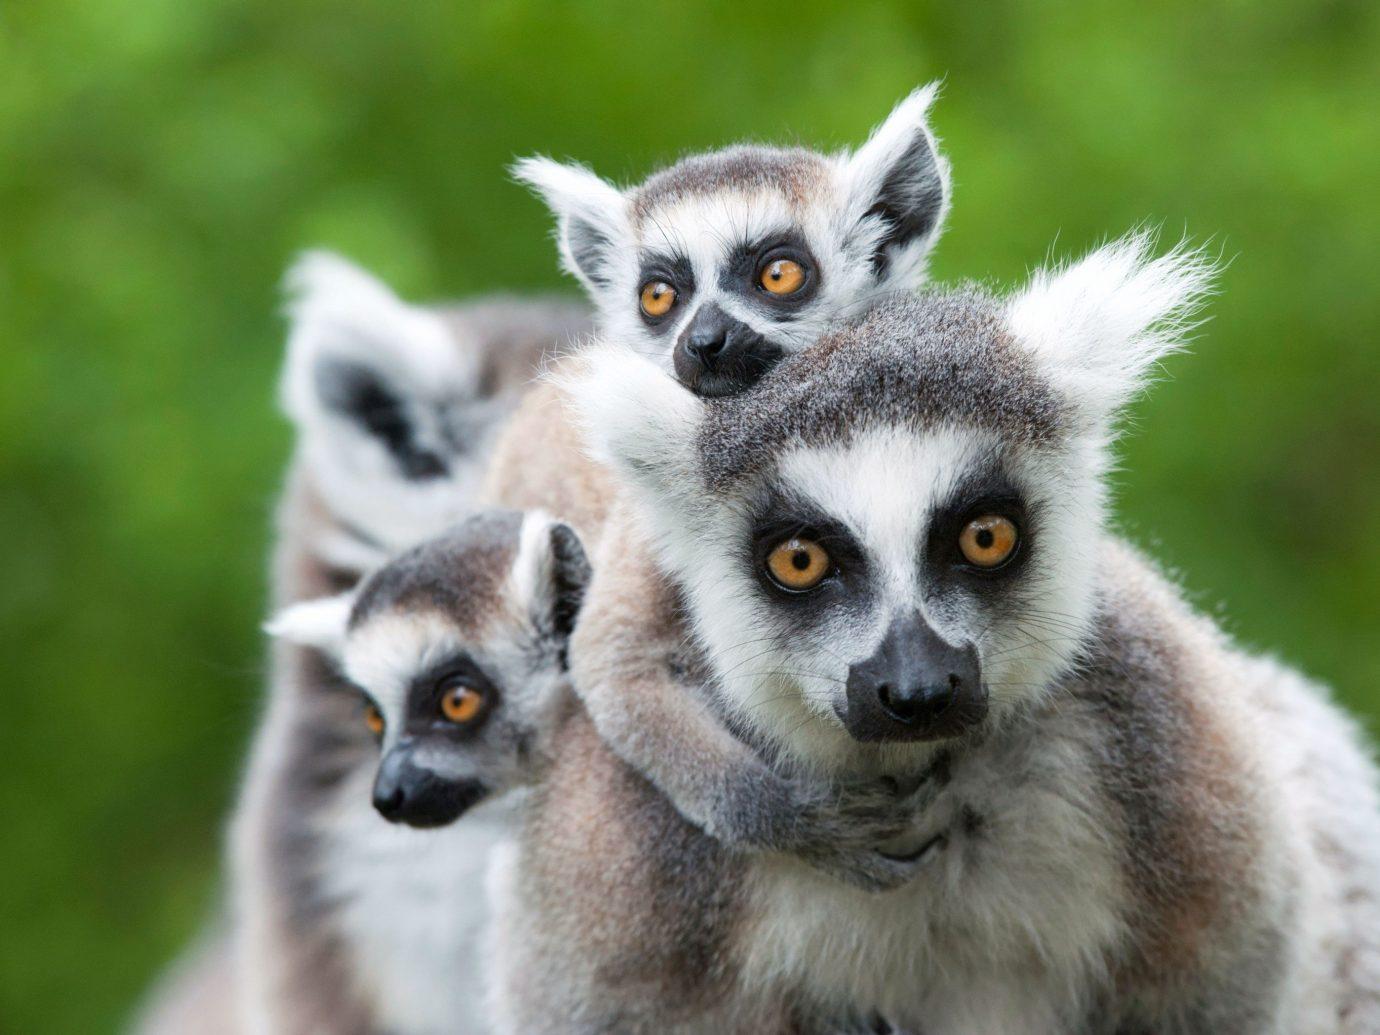 Trip Ideas mammal animal lemur vertebrate primate langur Wildlife fauna squirrel monkey pygmy slow loris loris new world monkey close staring bassarisk